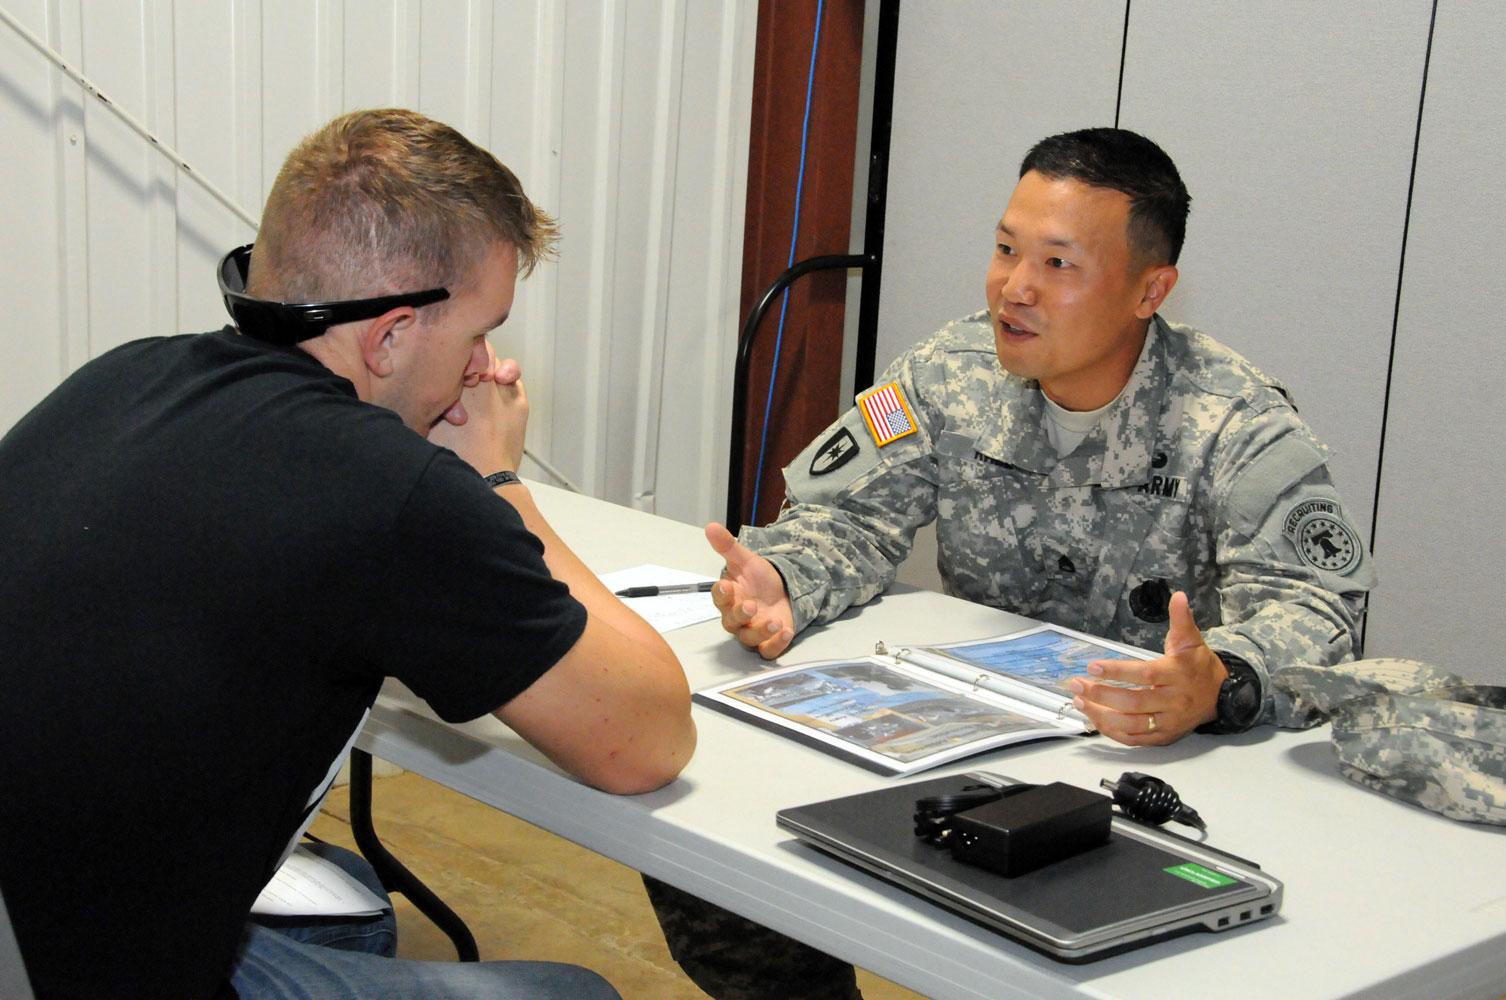 APNewsBreak: Army misses 2018 recruiting goal | Federal News